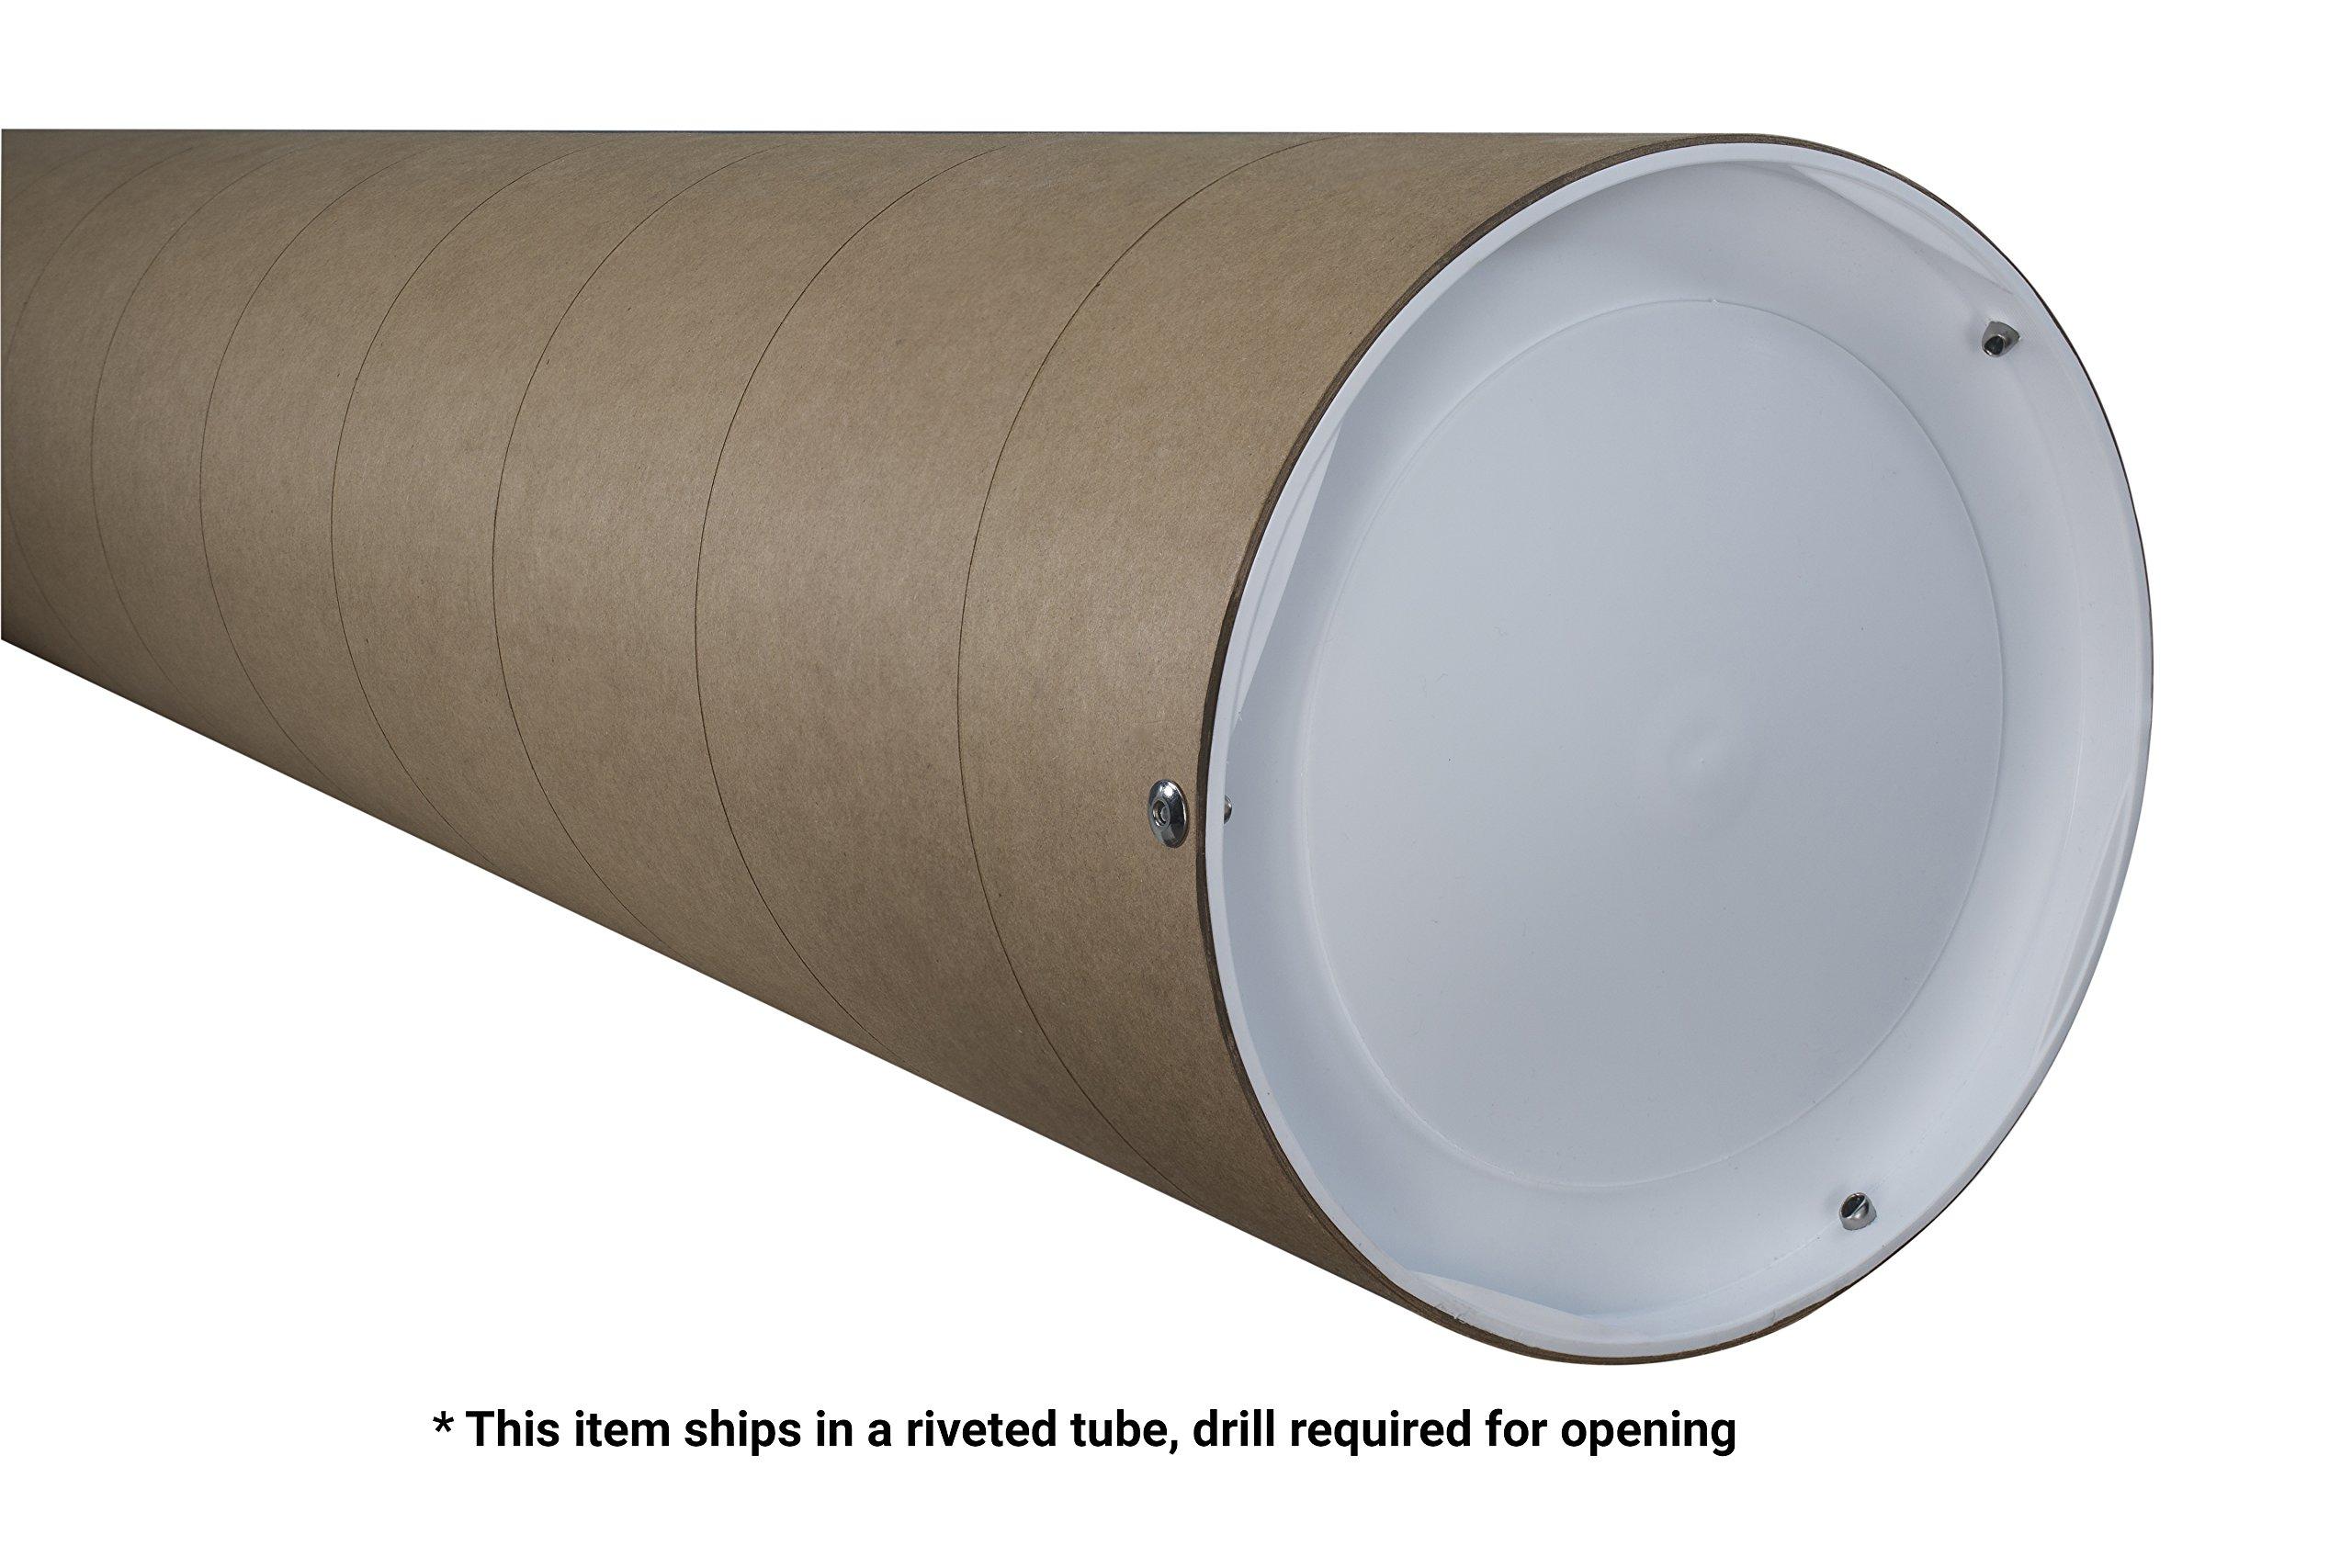 Arctic White RV Fiberglass/Filon Siding (5ft) by RecPro (Image #2)